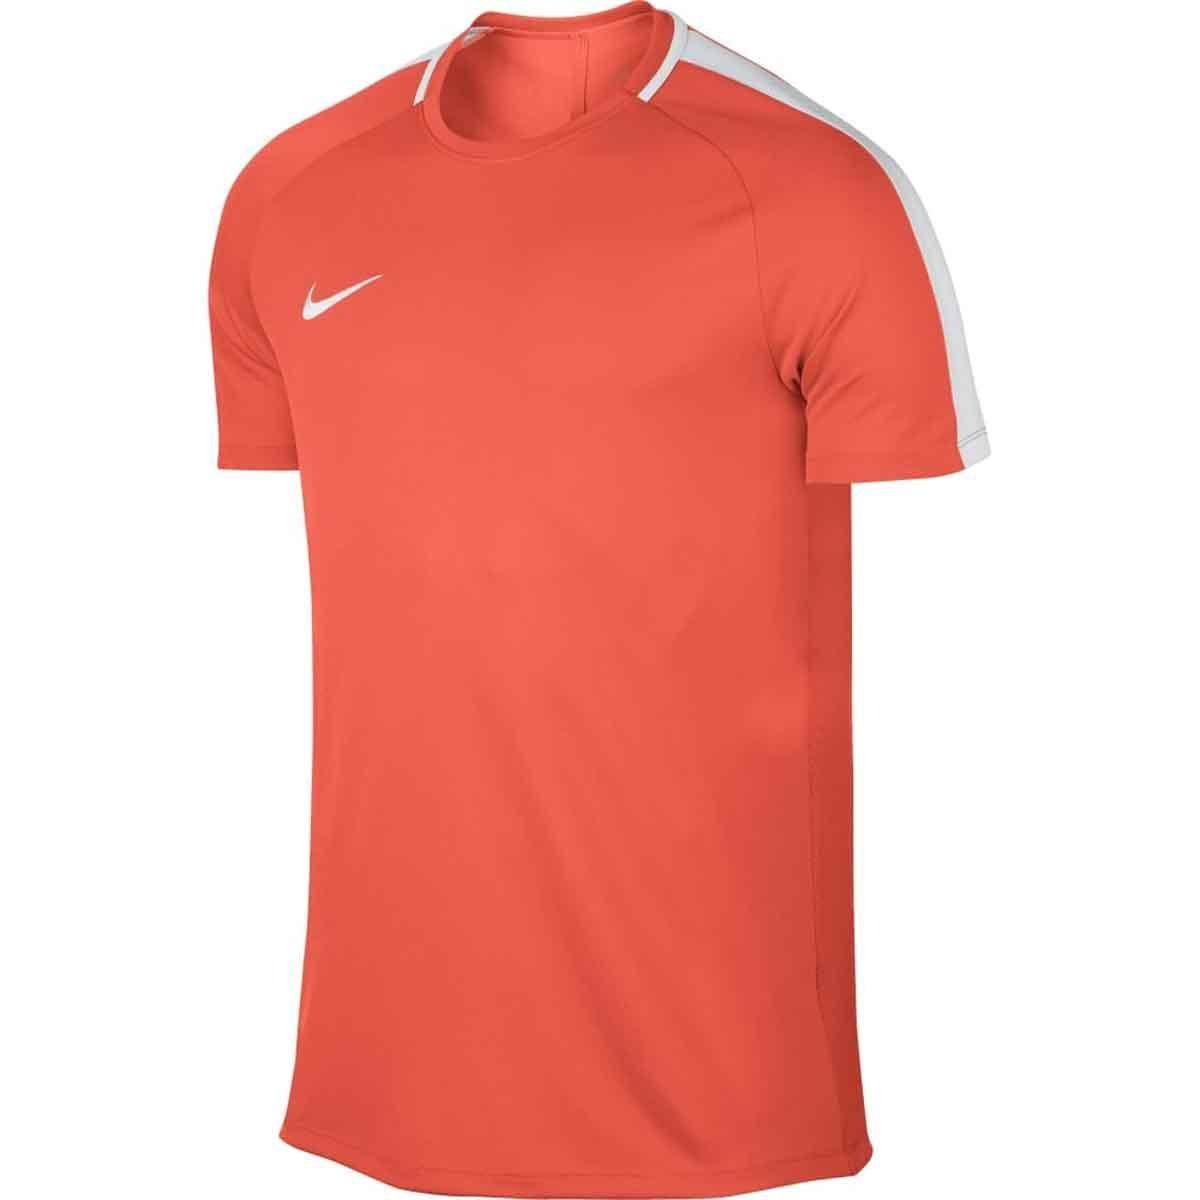 toxicidad Zumbido científico  Buy Nike Men's Dry Academy Football T-Shirt (Orange/White) Online